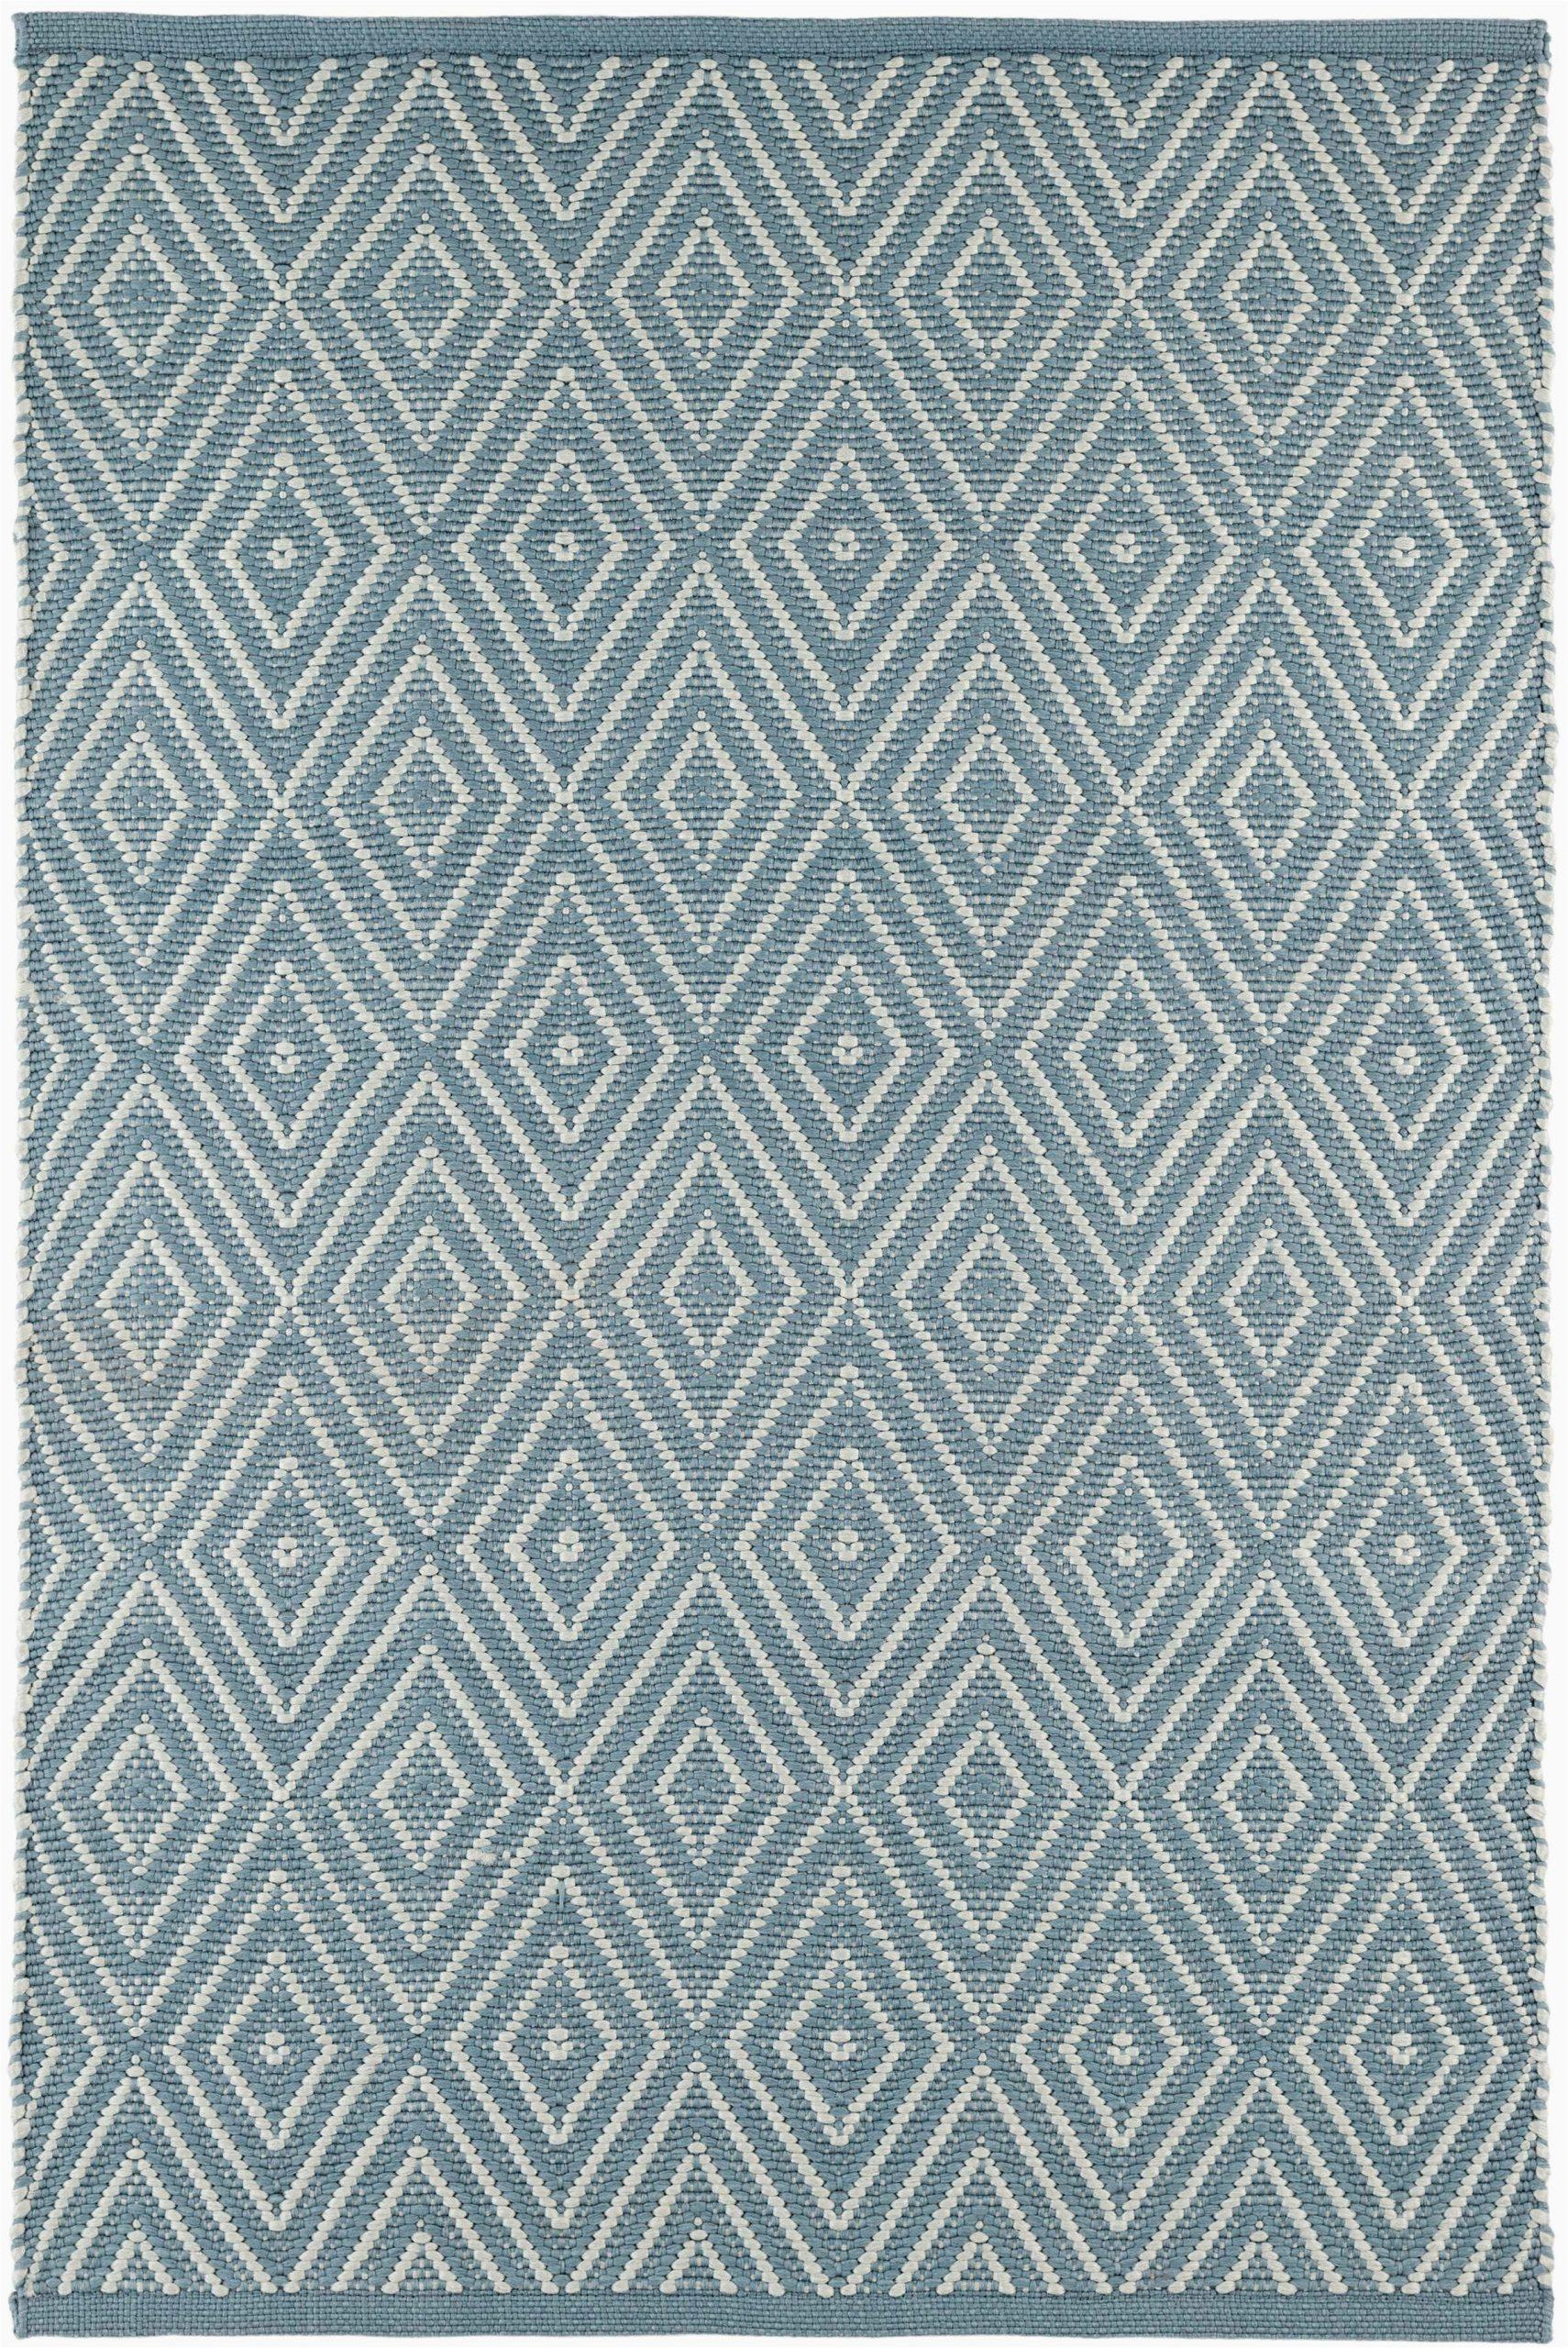 diamond geometric hand knotted light blue indooroutdoor area rug